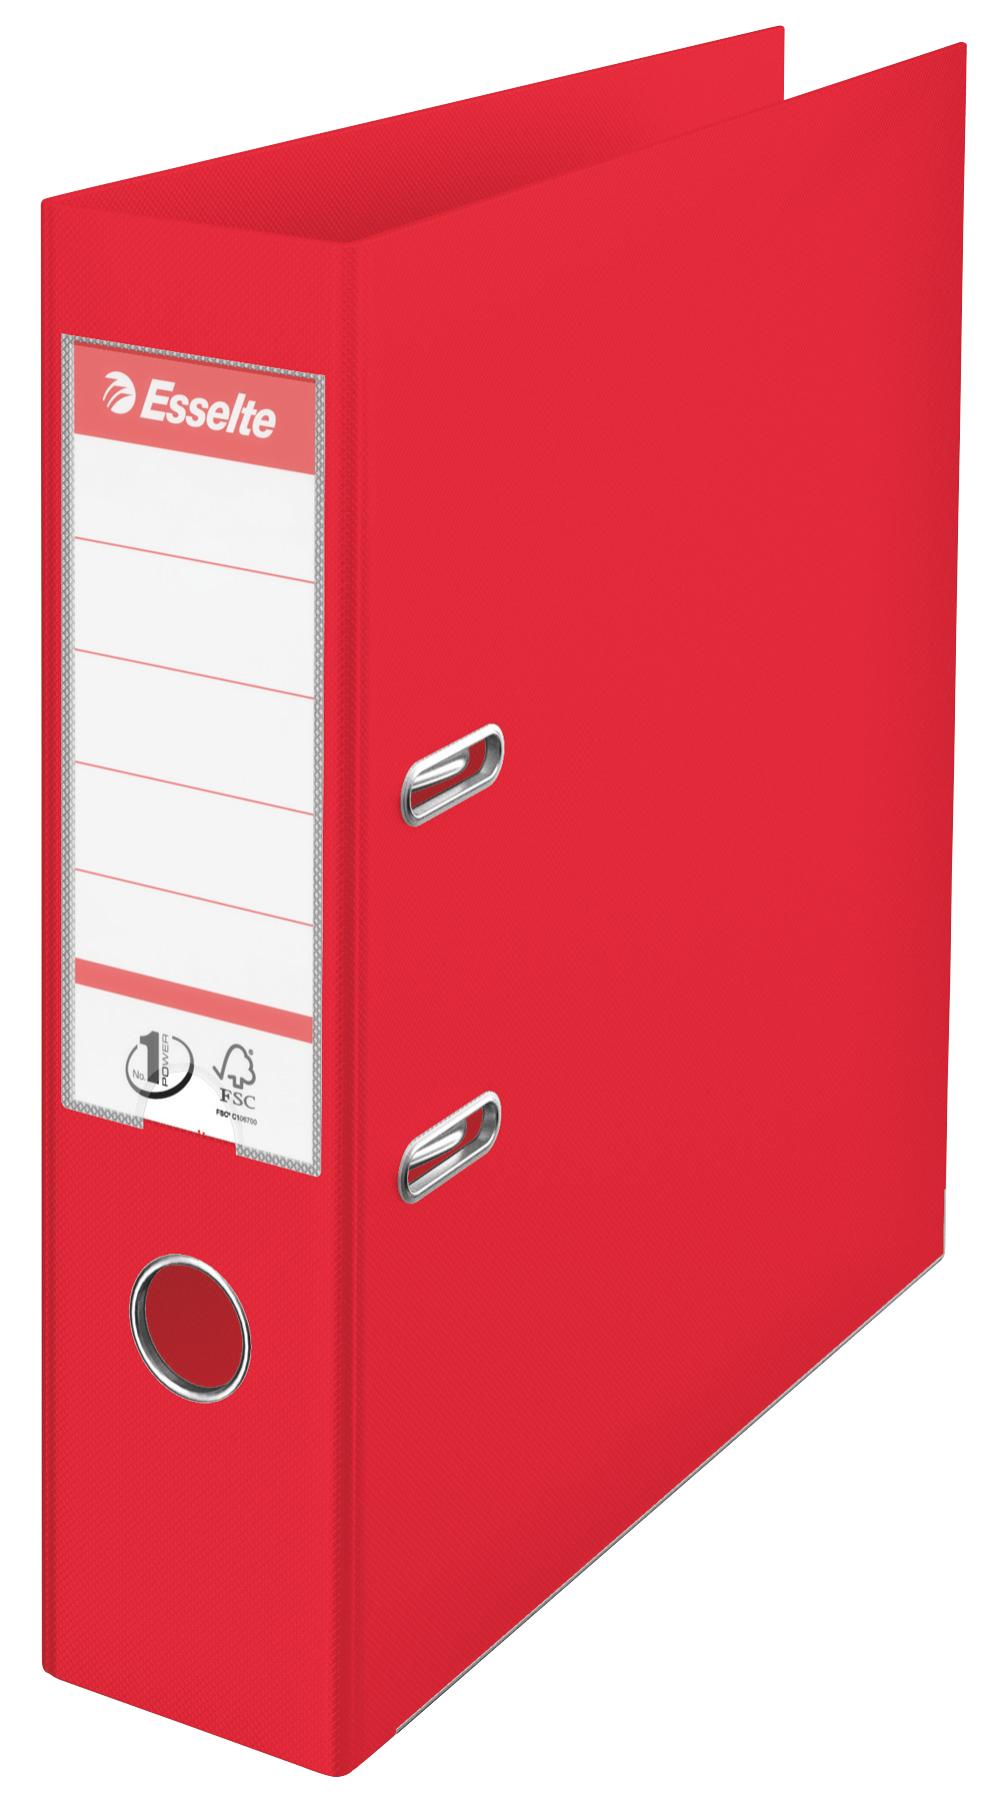 Esselte No.1 VIVIDA Lever Arch File Polypropylene A4 75mm Spine Width Red (Pack 10) 624068